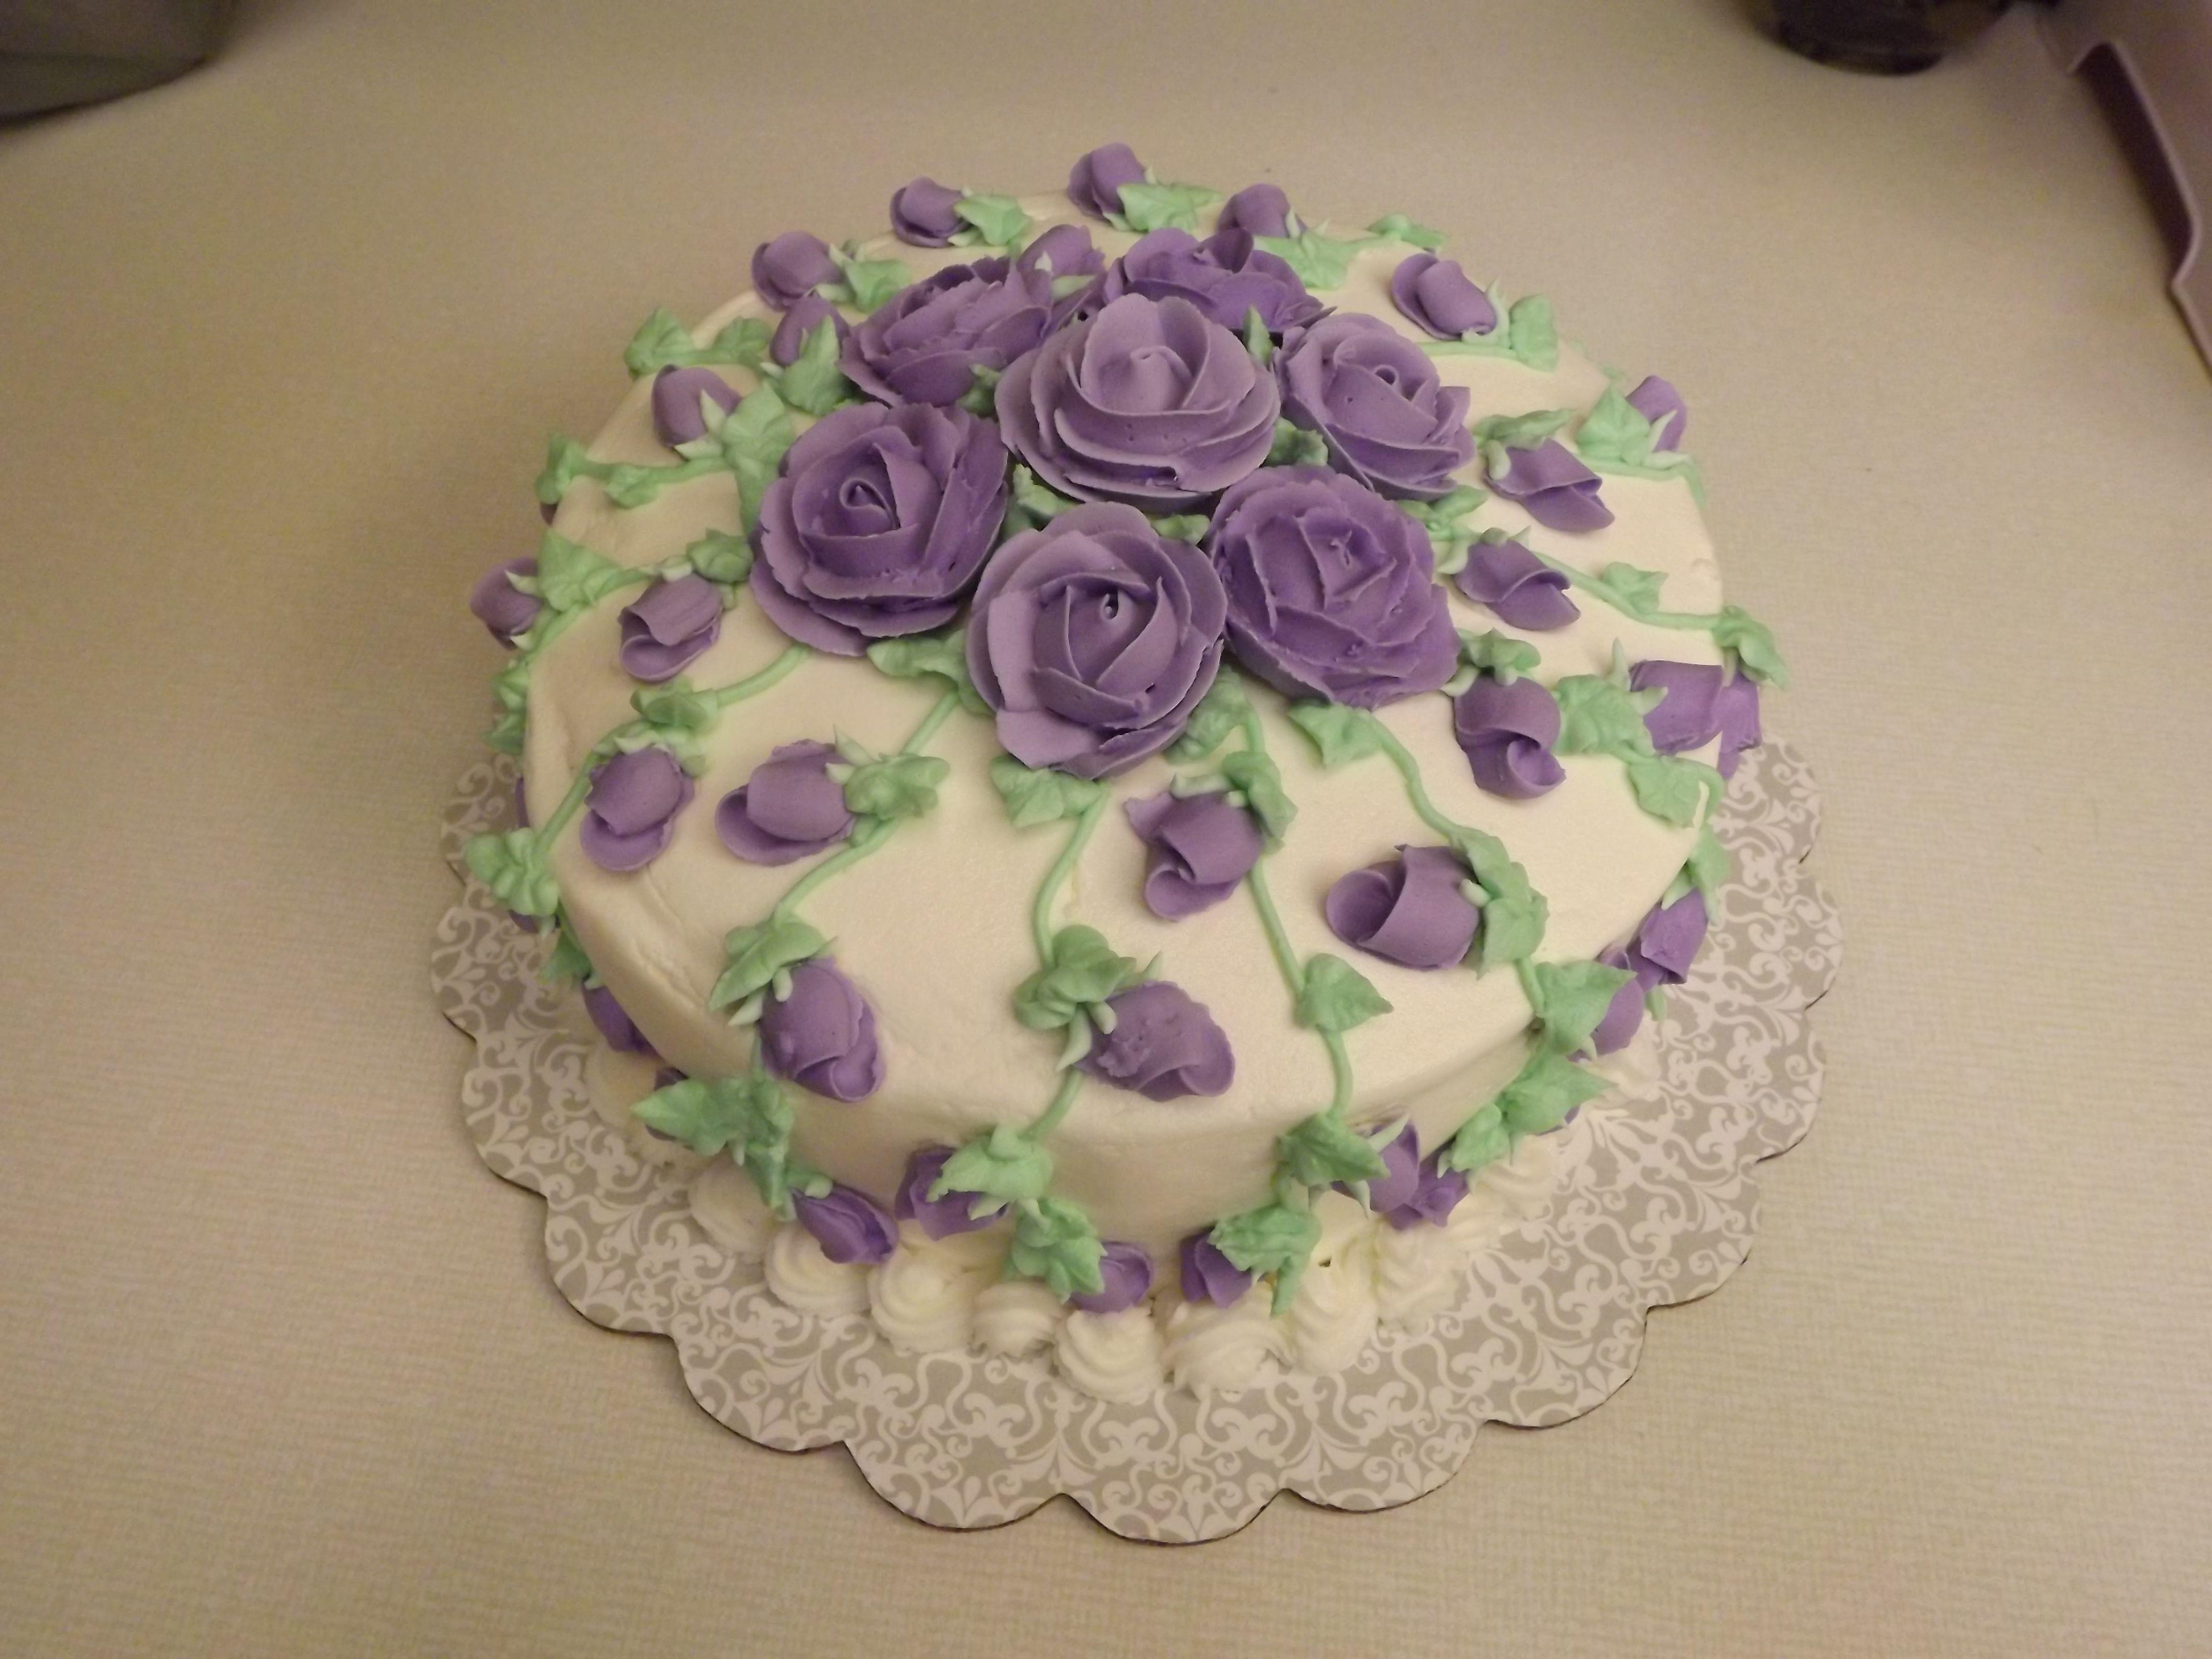 Final Cake From Wilton Course 2 Michael Dussert Sullivan In Sarasota Fl Wiltoncontest Cake Decorating Books Cake Decorating Cake Creations